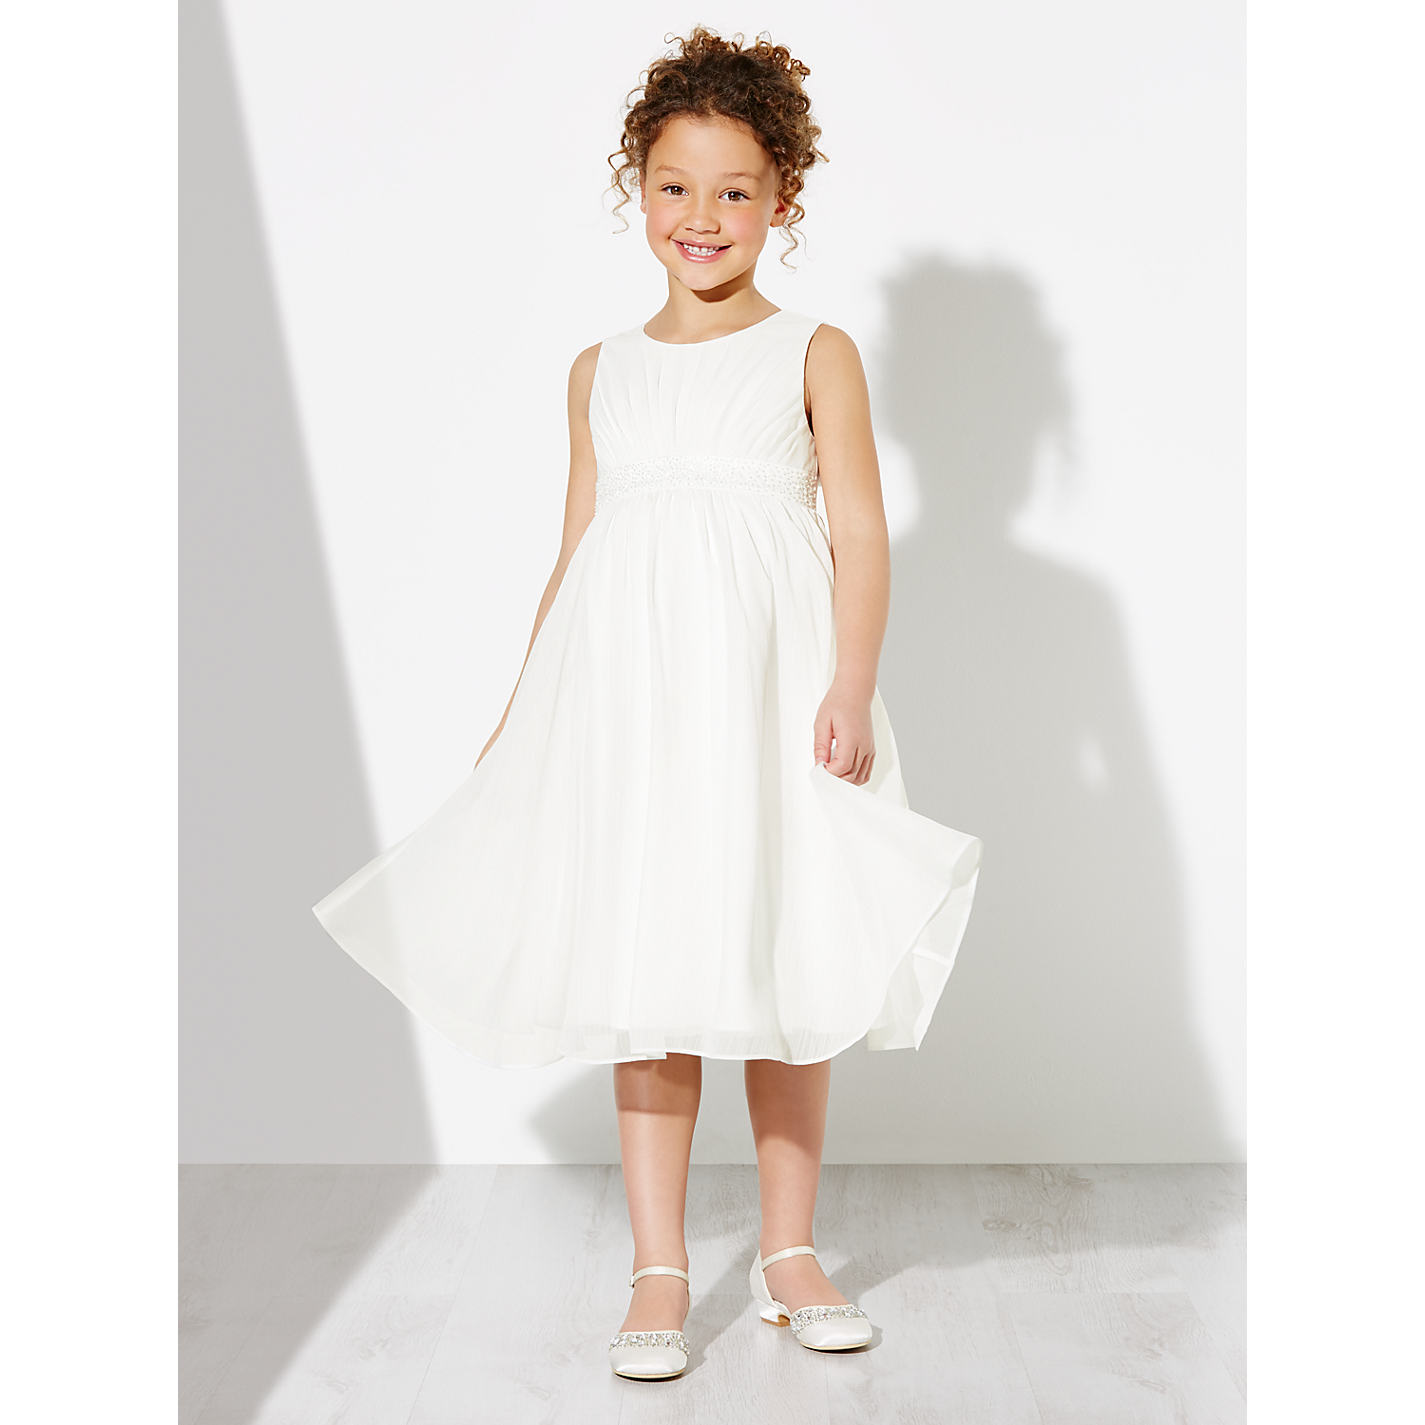 Buy john lewis girls ava beaded chiffon bridesmaid dress ivory buy john lewis girls ava beaded chiffon bridesmaid dress ivory online at johnlewis ombrellifo Choice Image